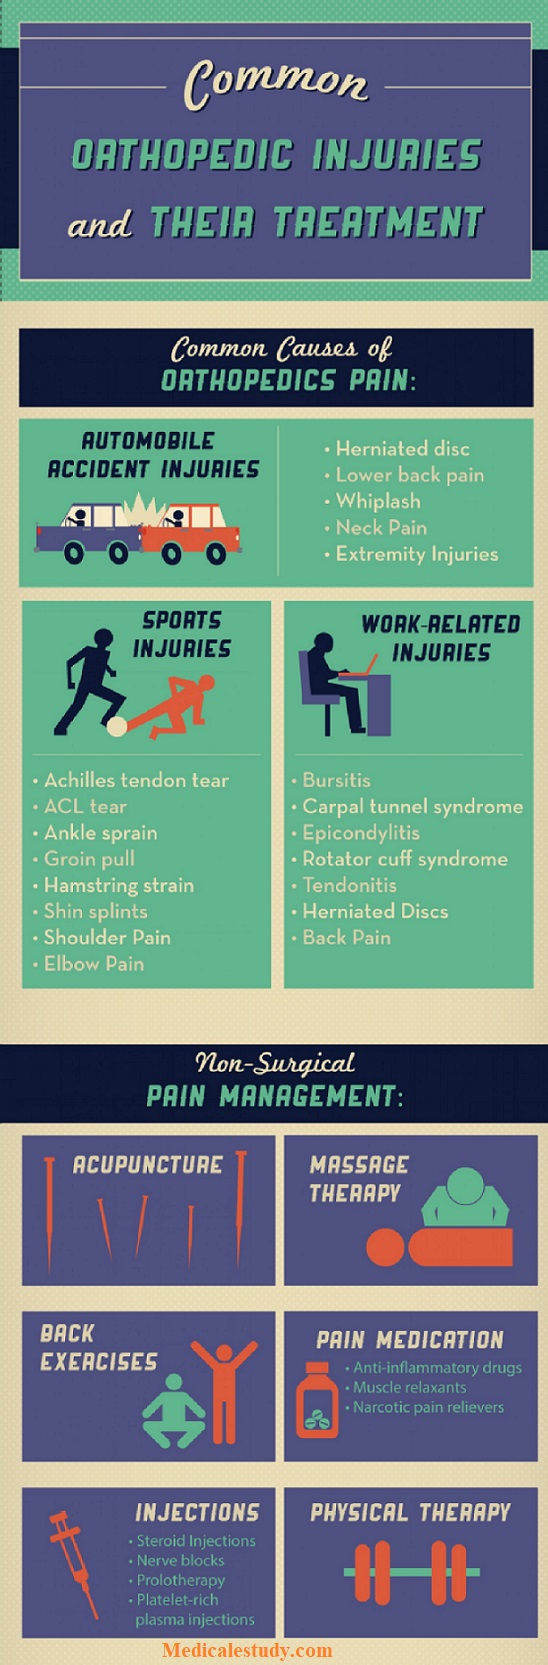 orthopedic-injuries